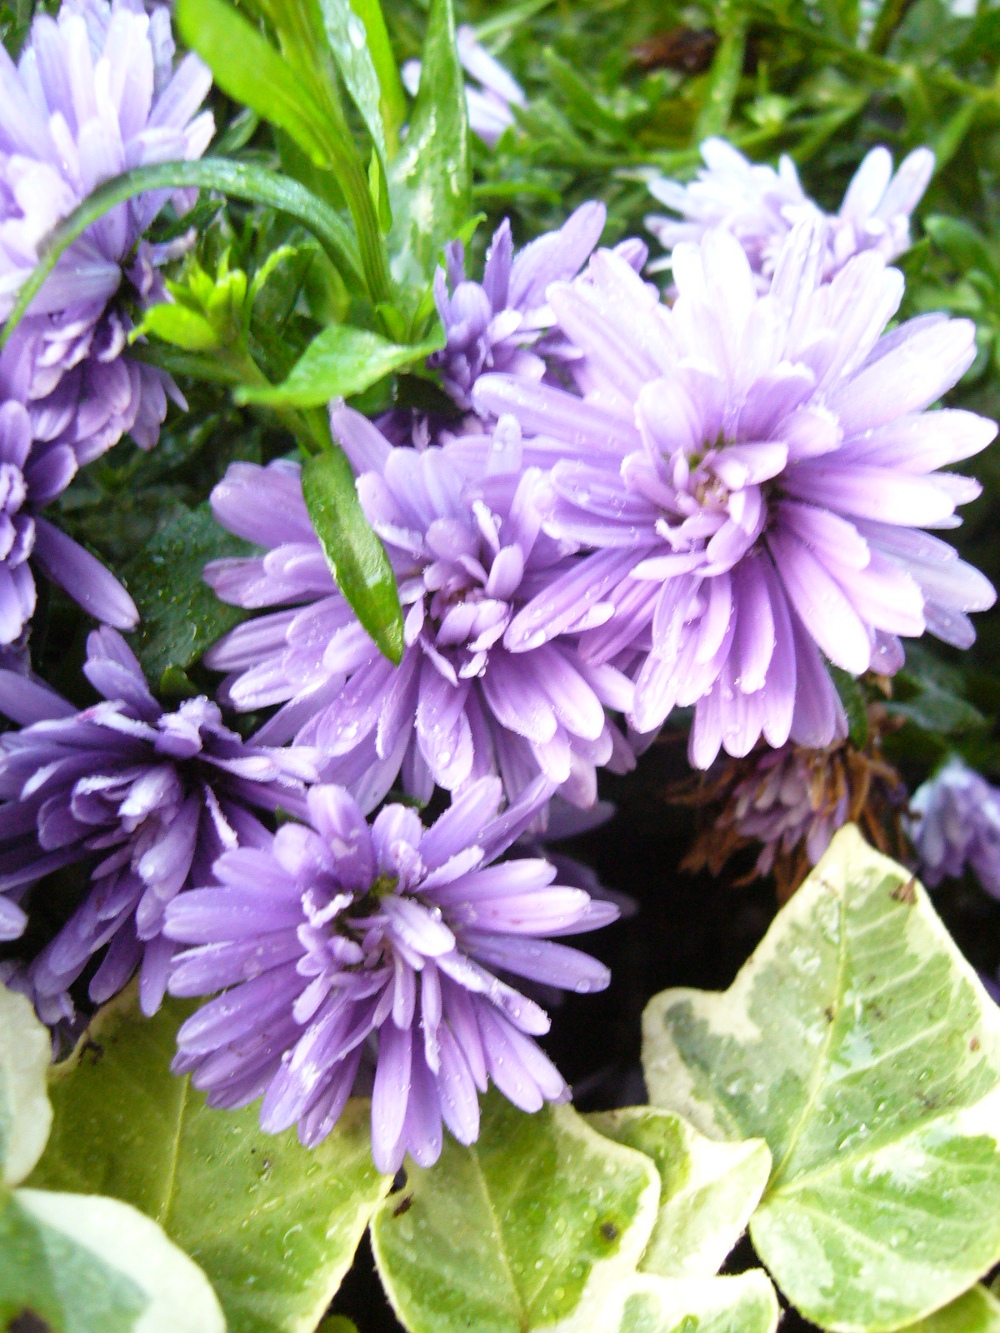 Fallblooming Asters and Ivy Bloom, Flowers, Plants